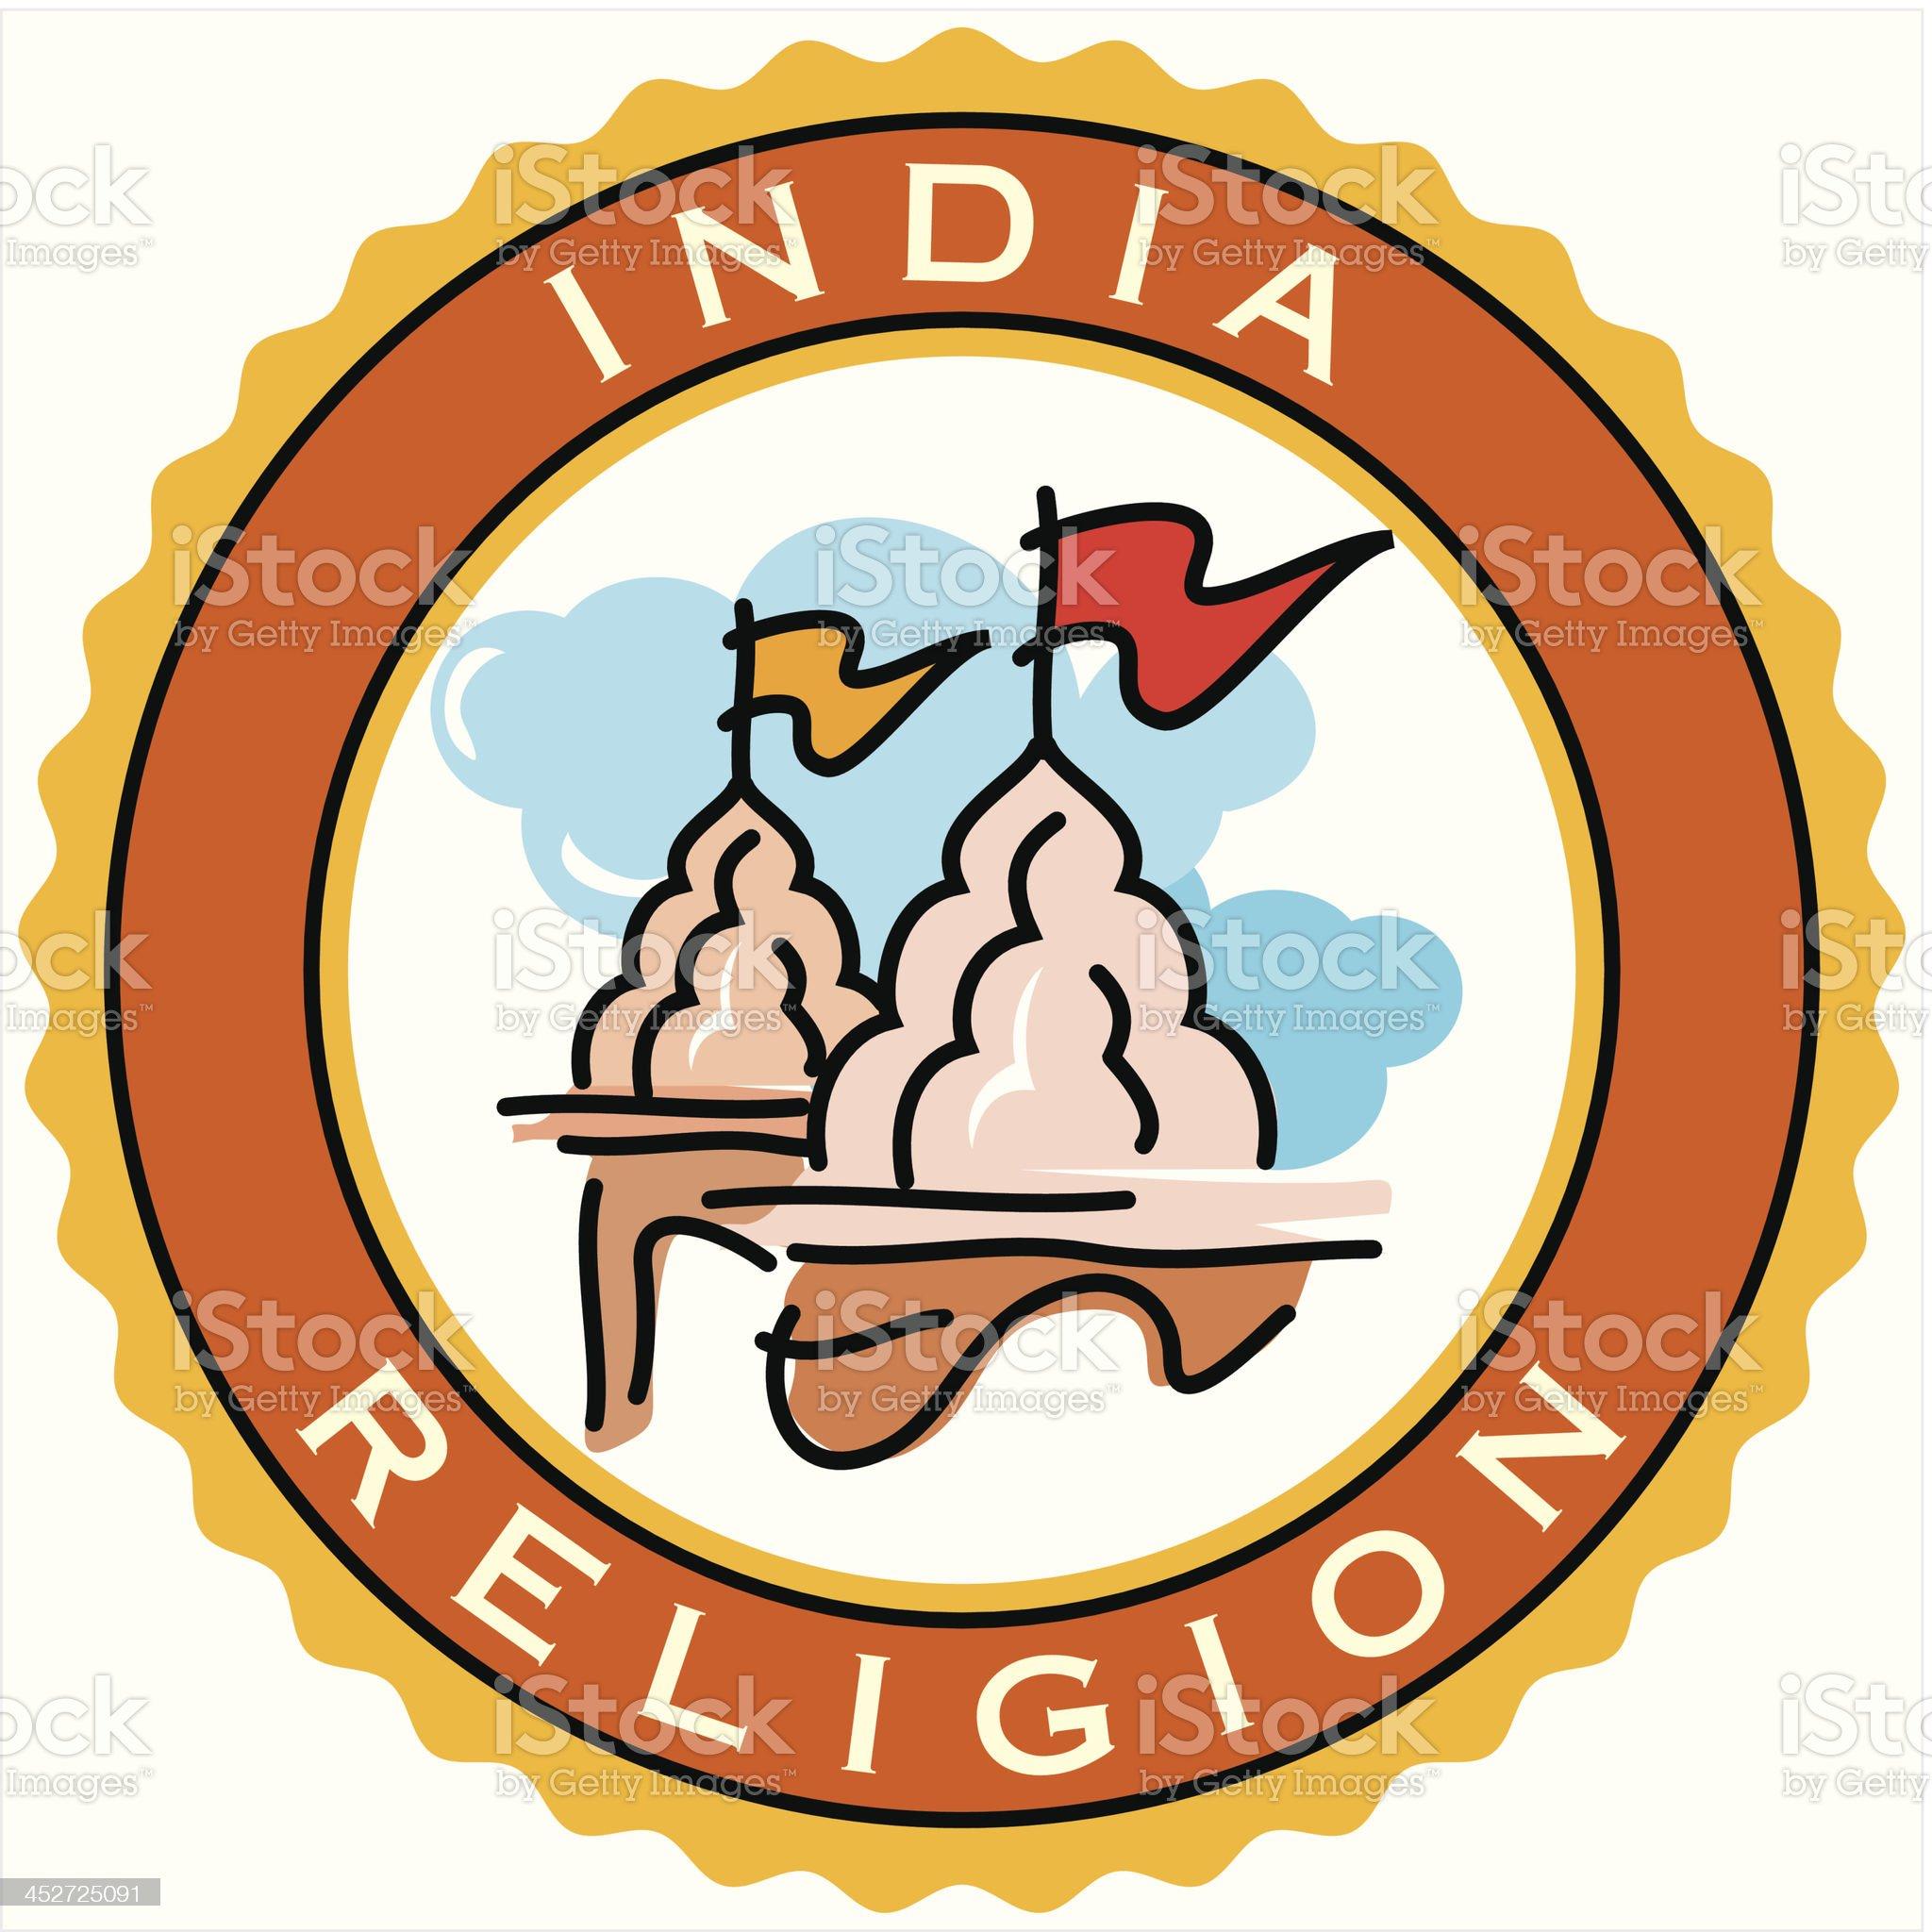 India religion label royalty-free stock vector art